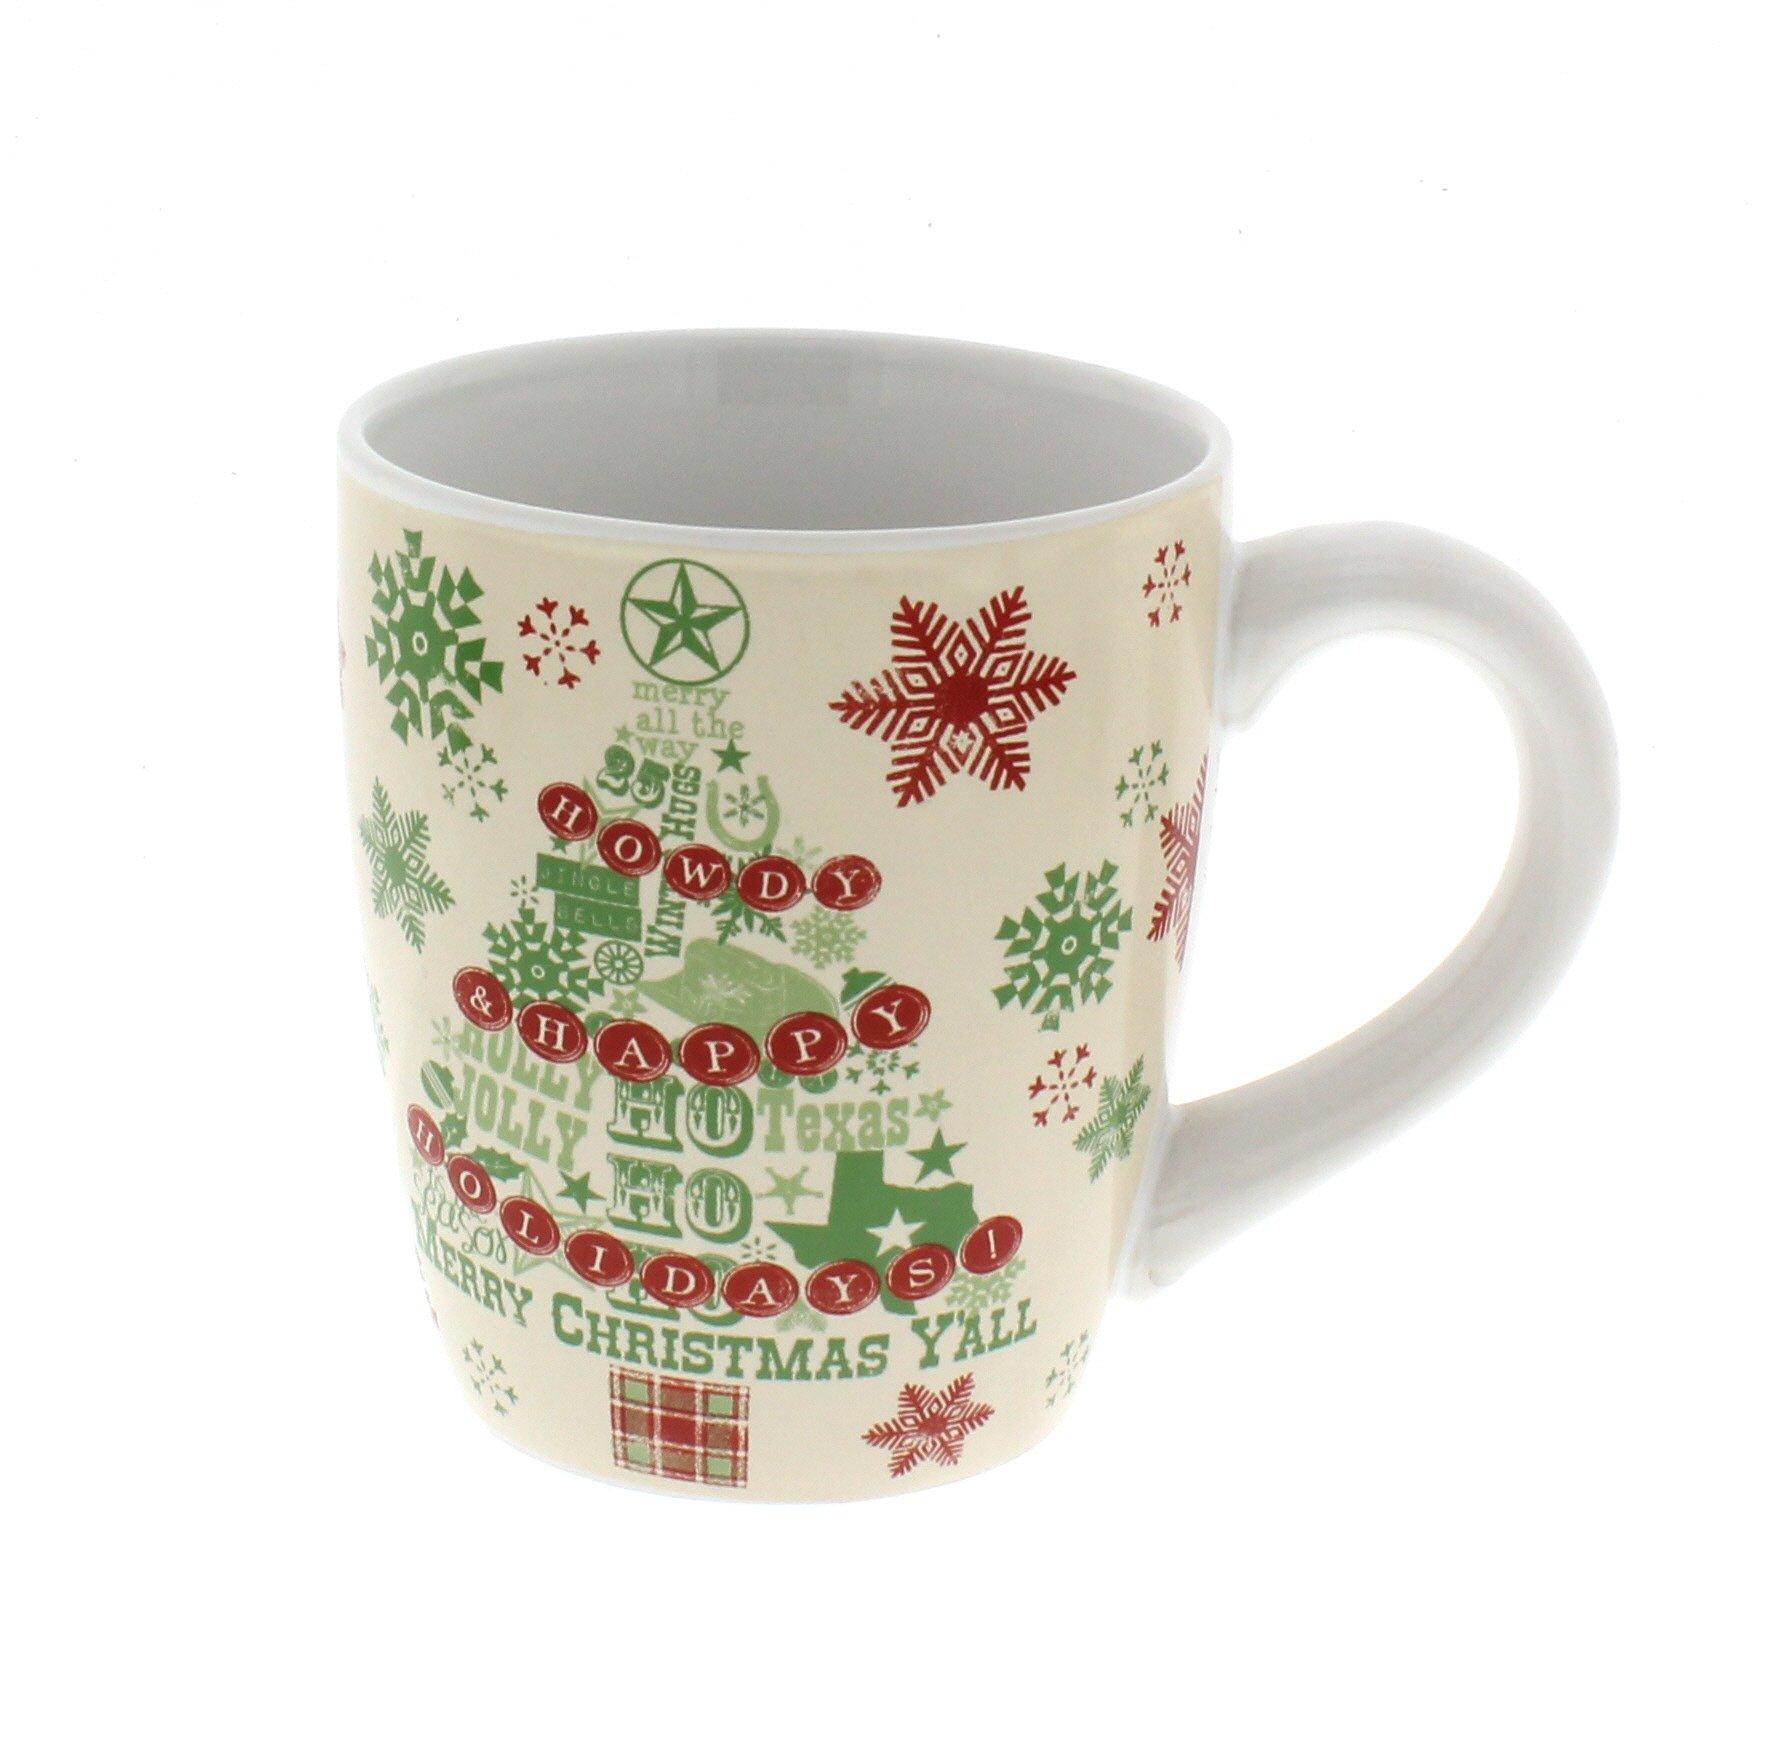 Dining Style Lone Star Christmas Stoneware Mug - Shop Glassware at HEB